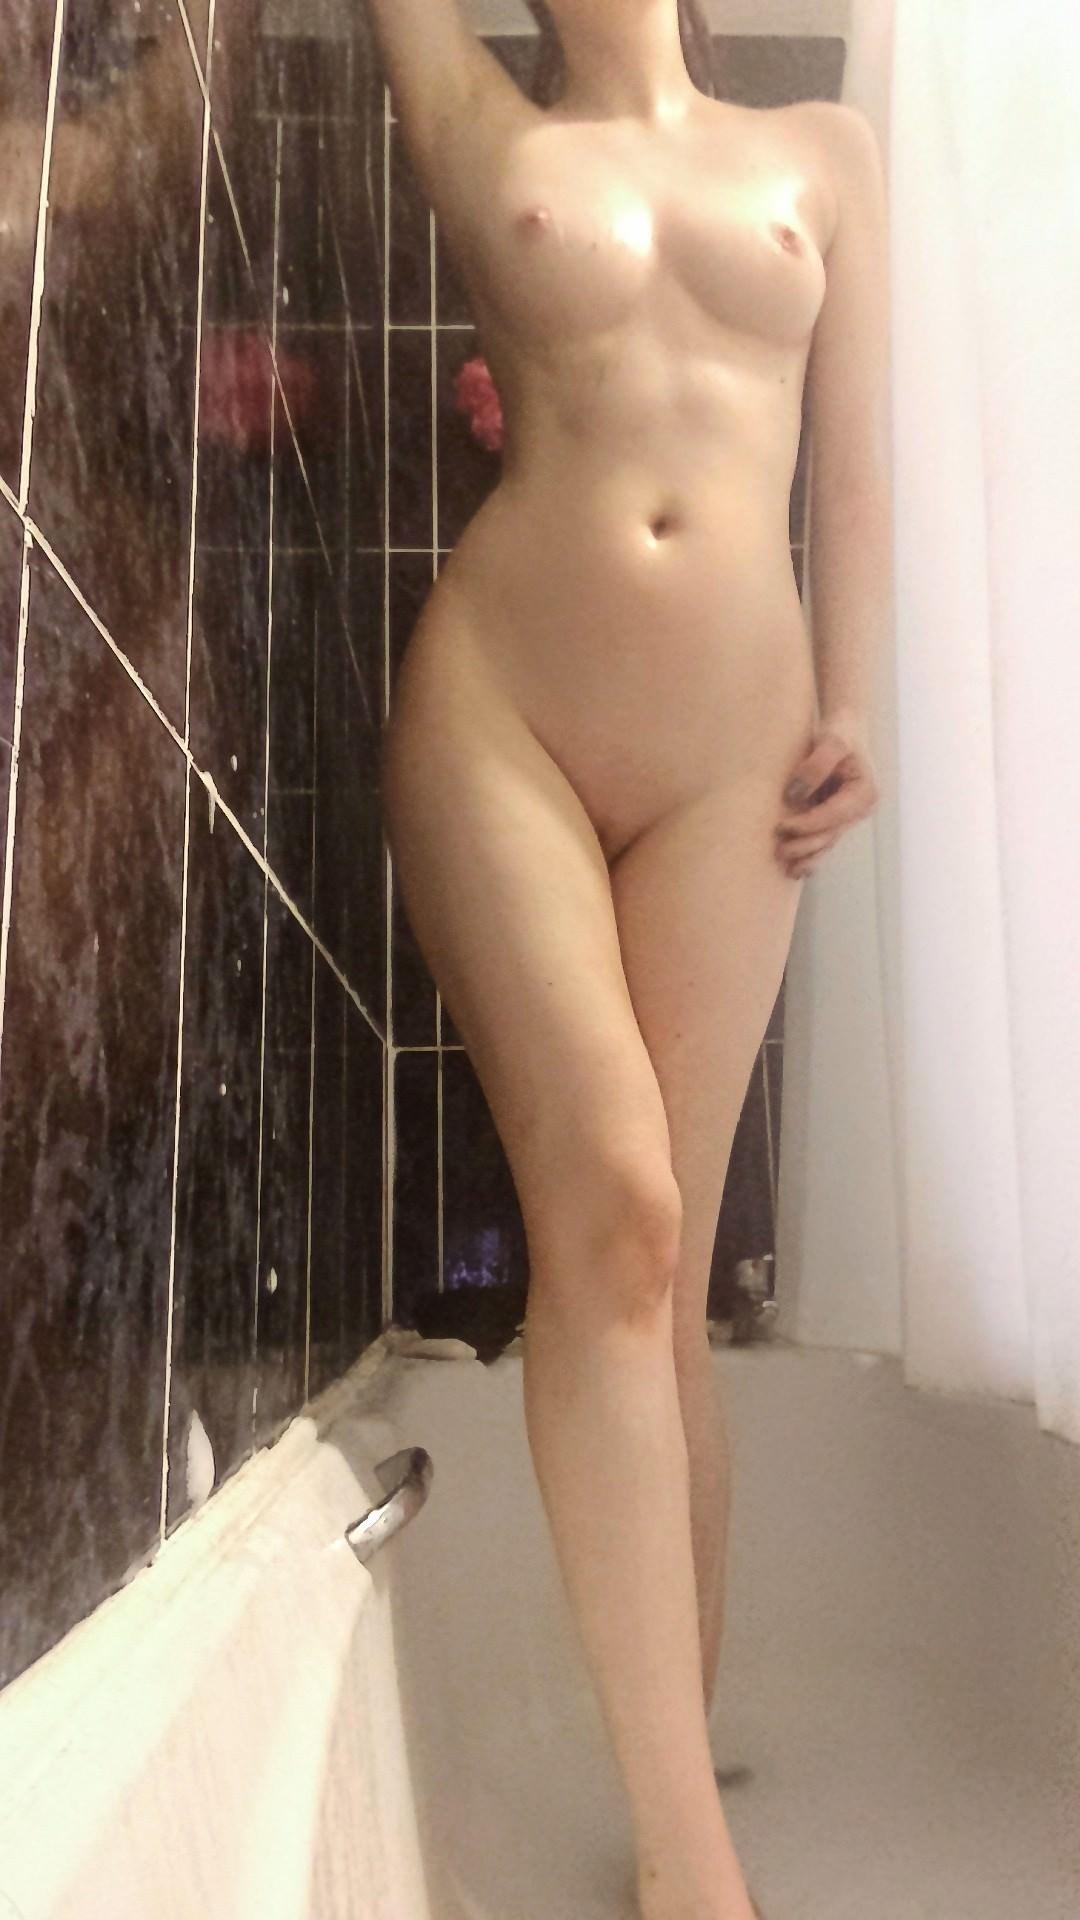 Naked Lesbians The Shower